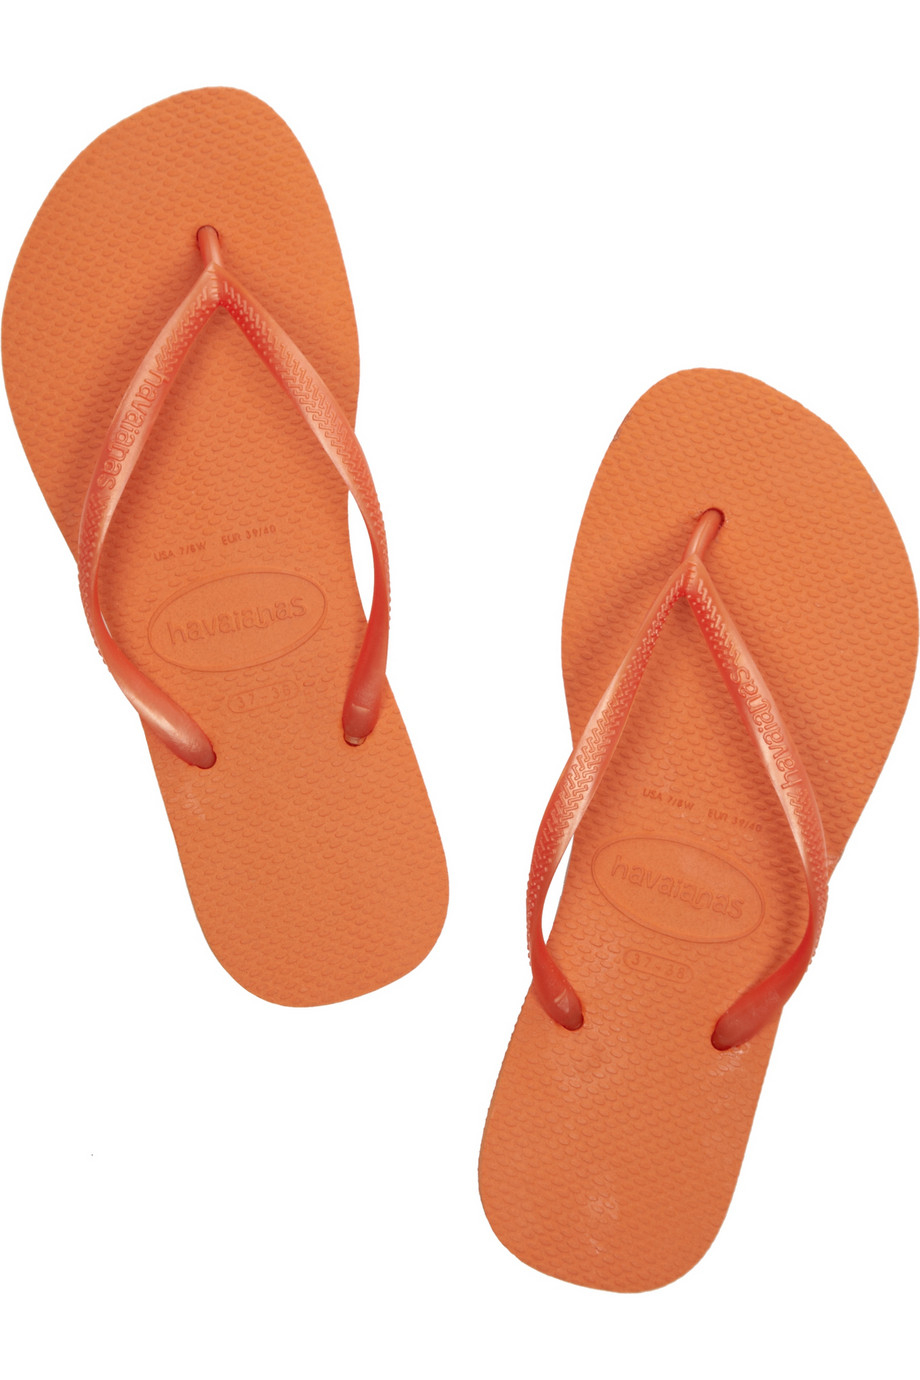 4b1bc57d2700 Lyst - Havaianas Slim Neon Rubber Flip Flops in Orange